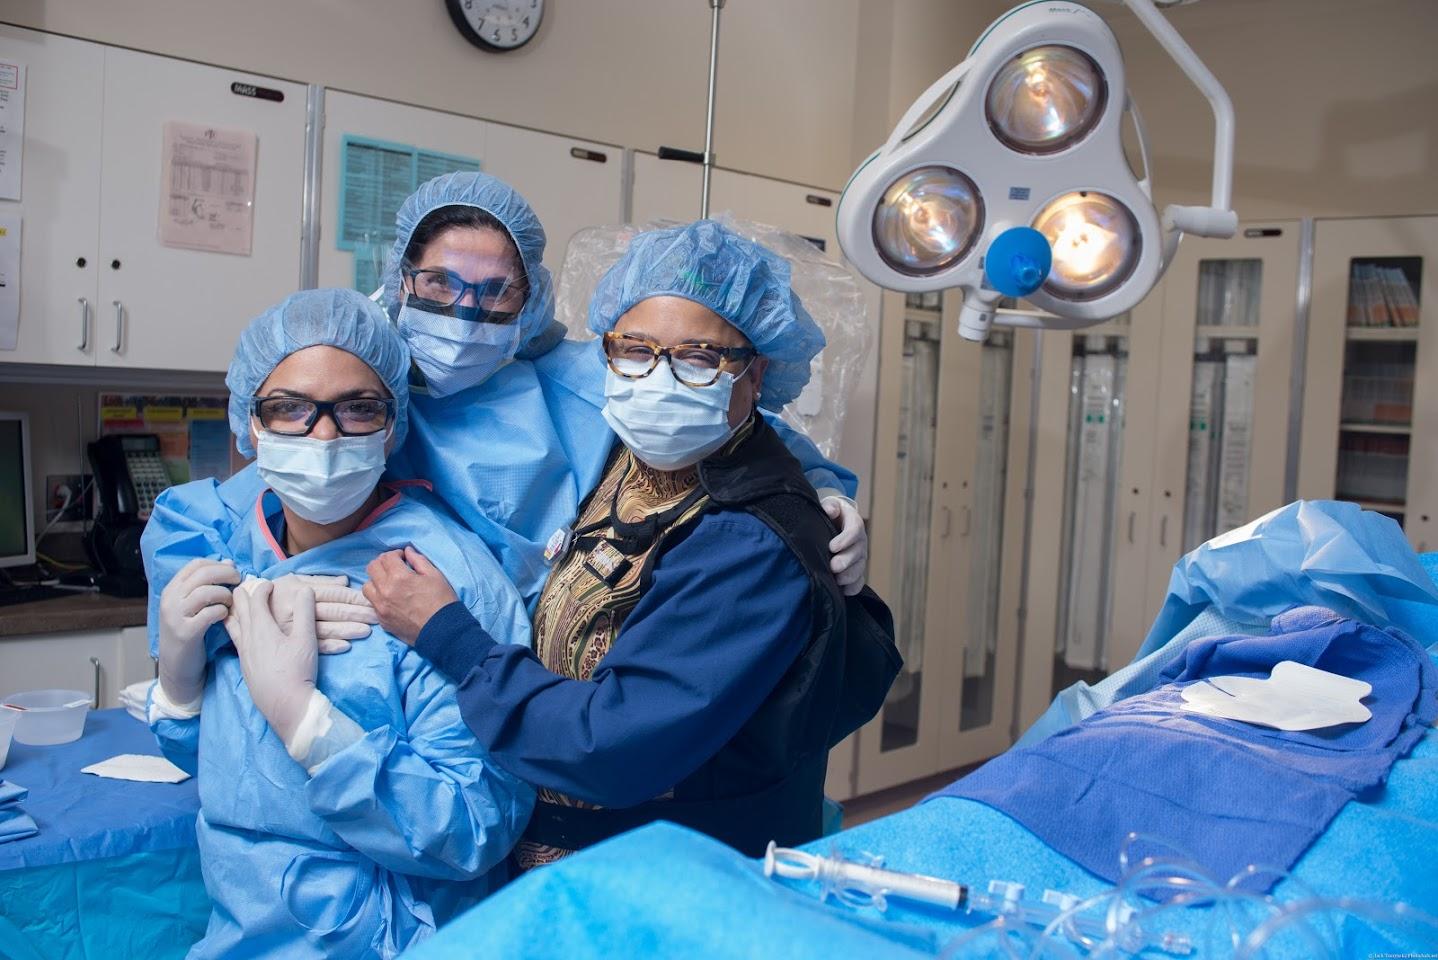 Nurses in an OR Room